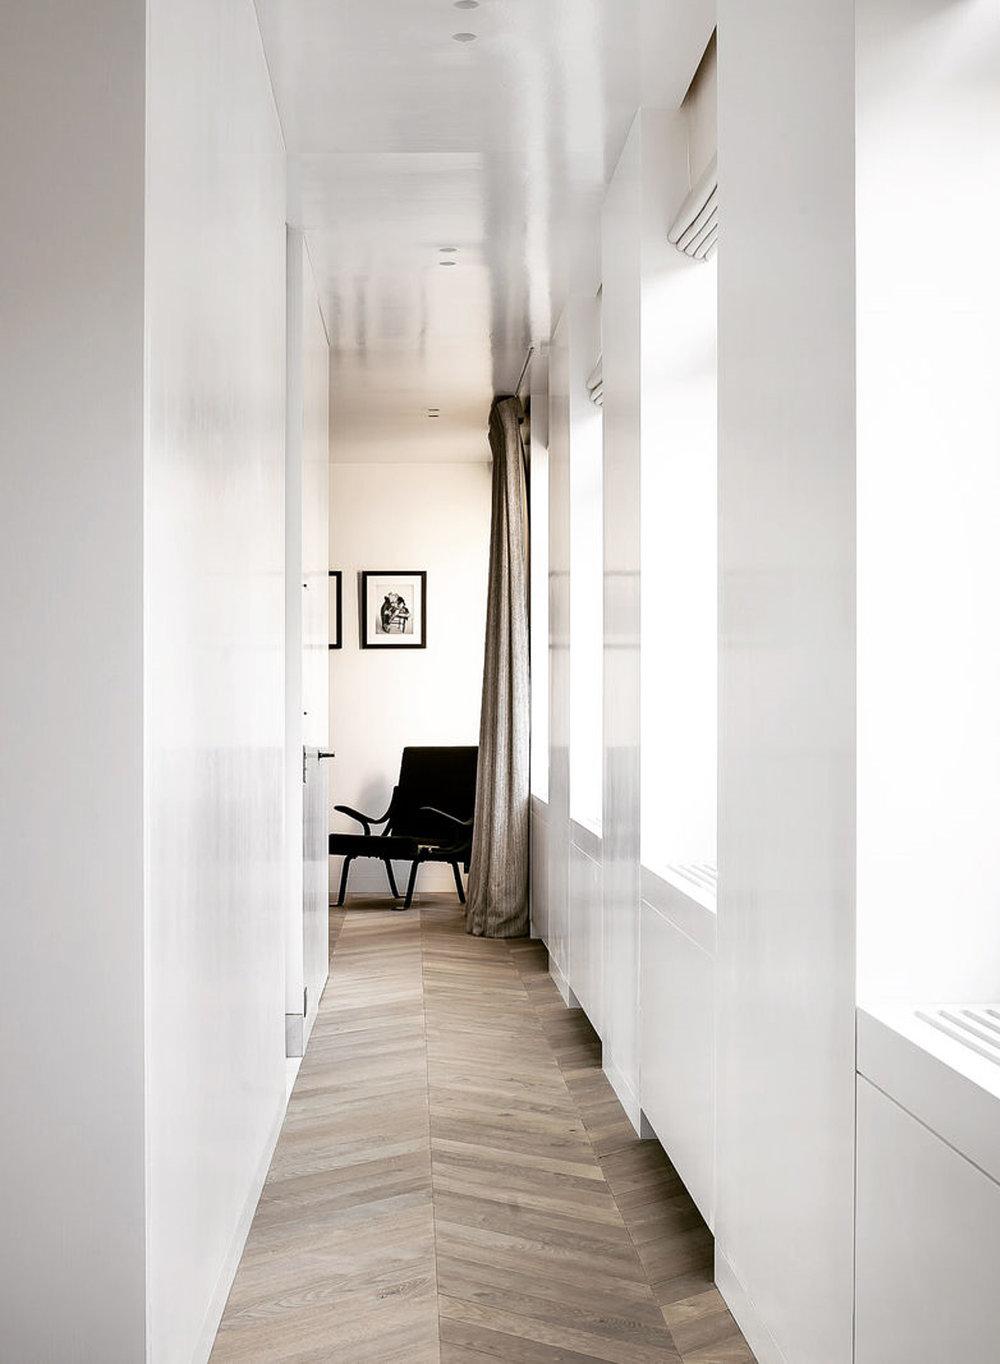 MK House by Nicolas Spuybroek on Anniversary Magazine